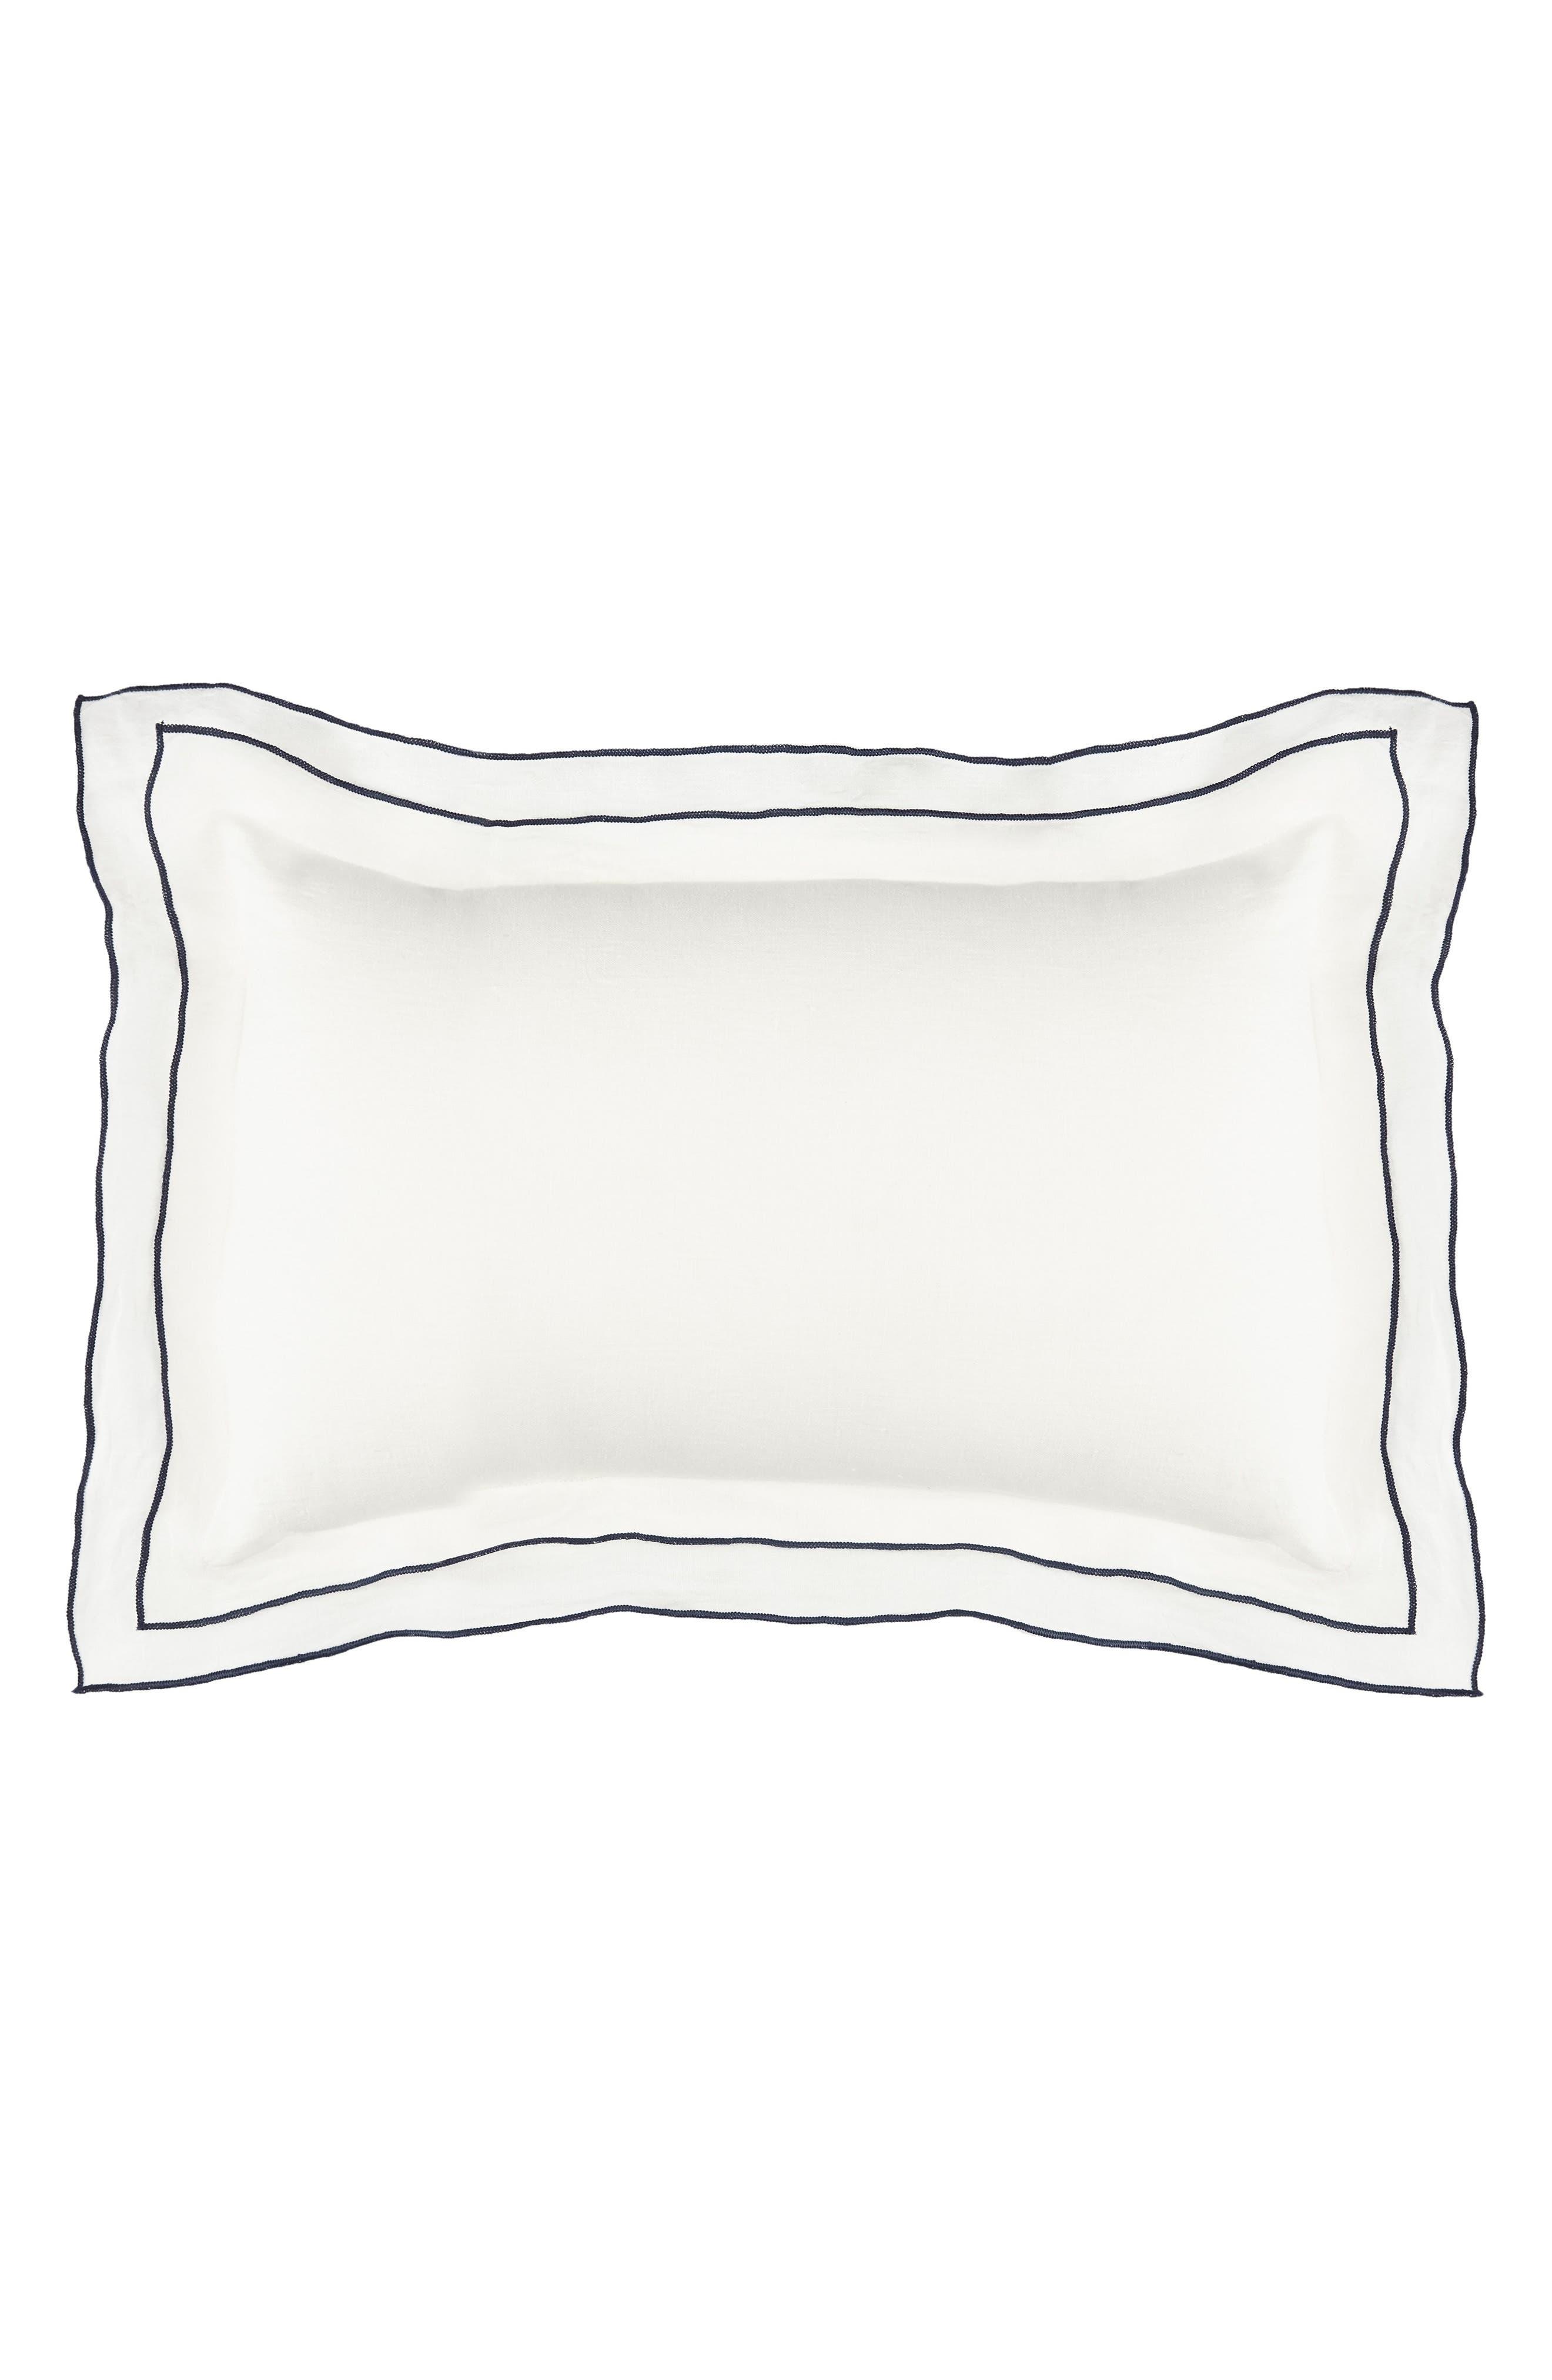 Biarritz Linen Accent Pillow,                         Main,                         color, White/ Indigo